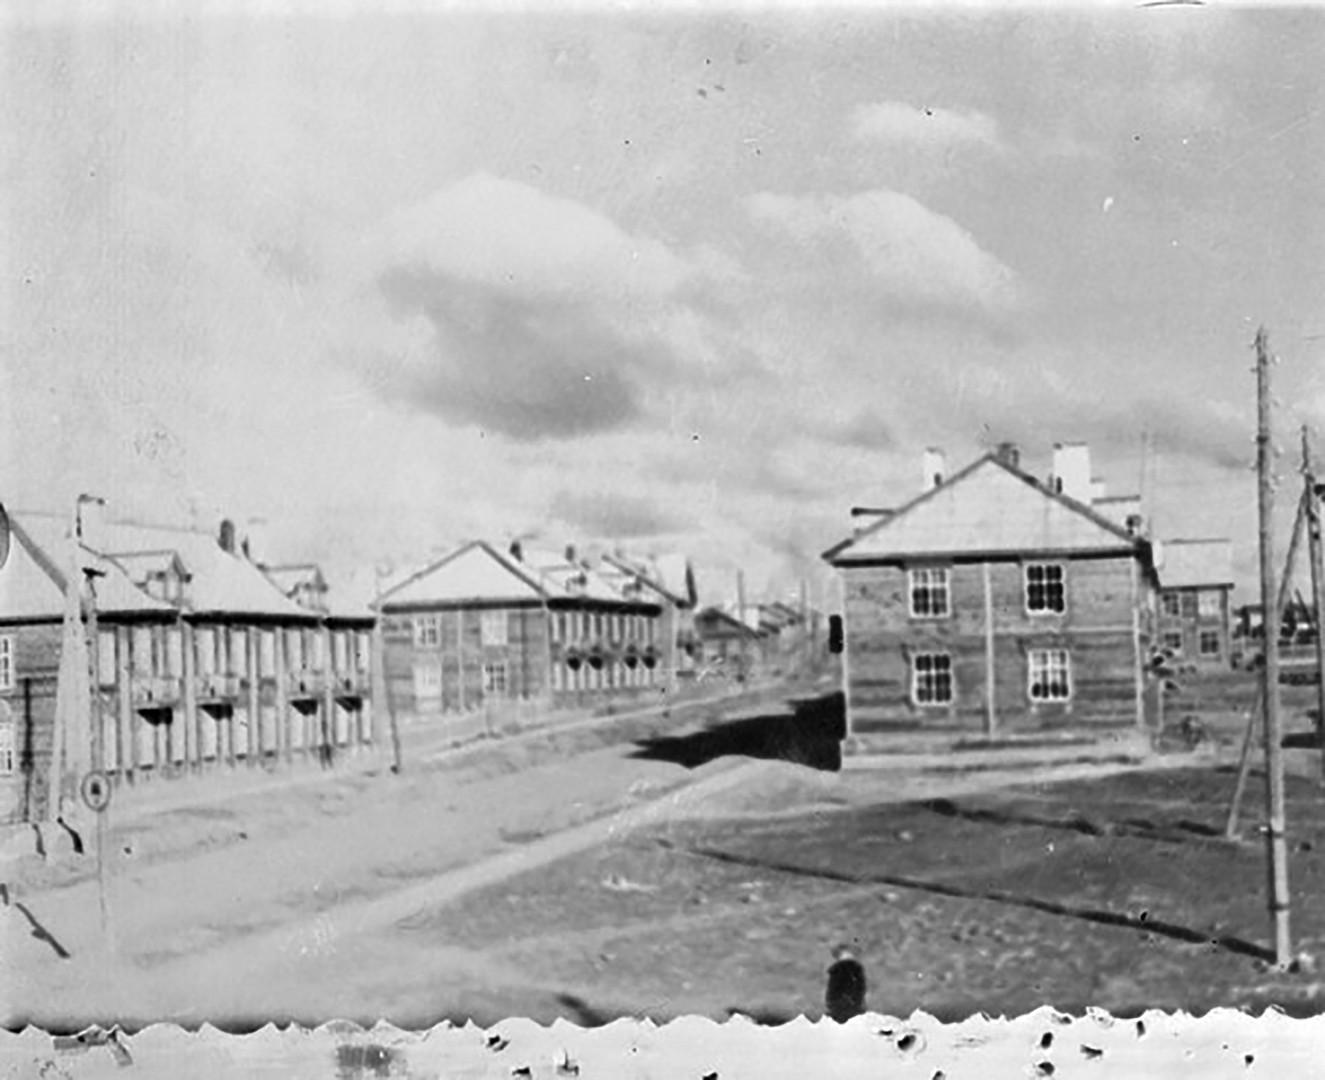 El pueblo Sverdlovsk-45, (actualmente Lesnói), óblast de Sverdlovsk